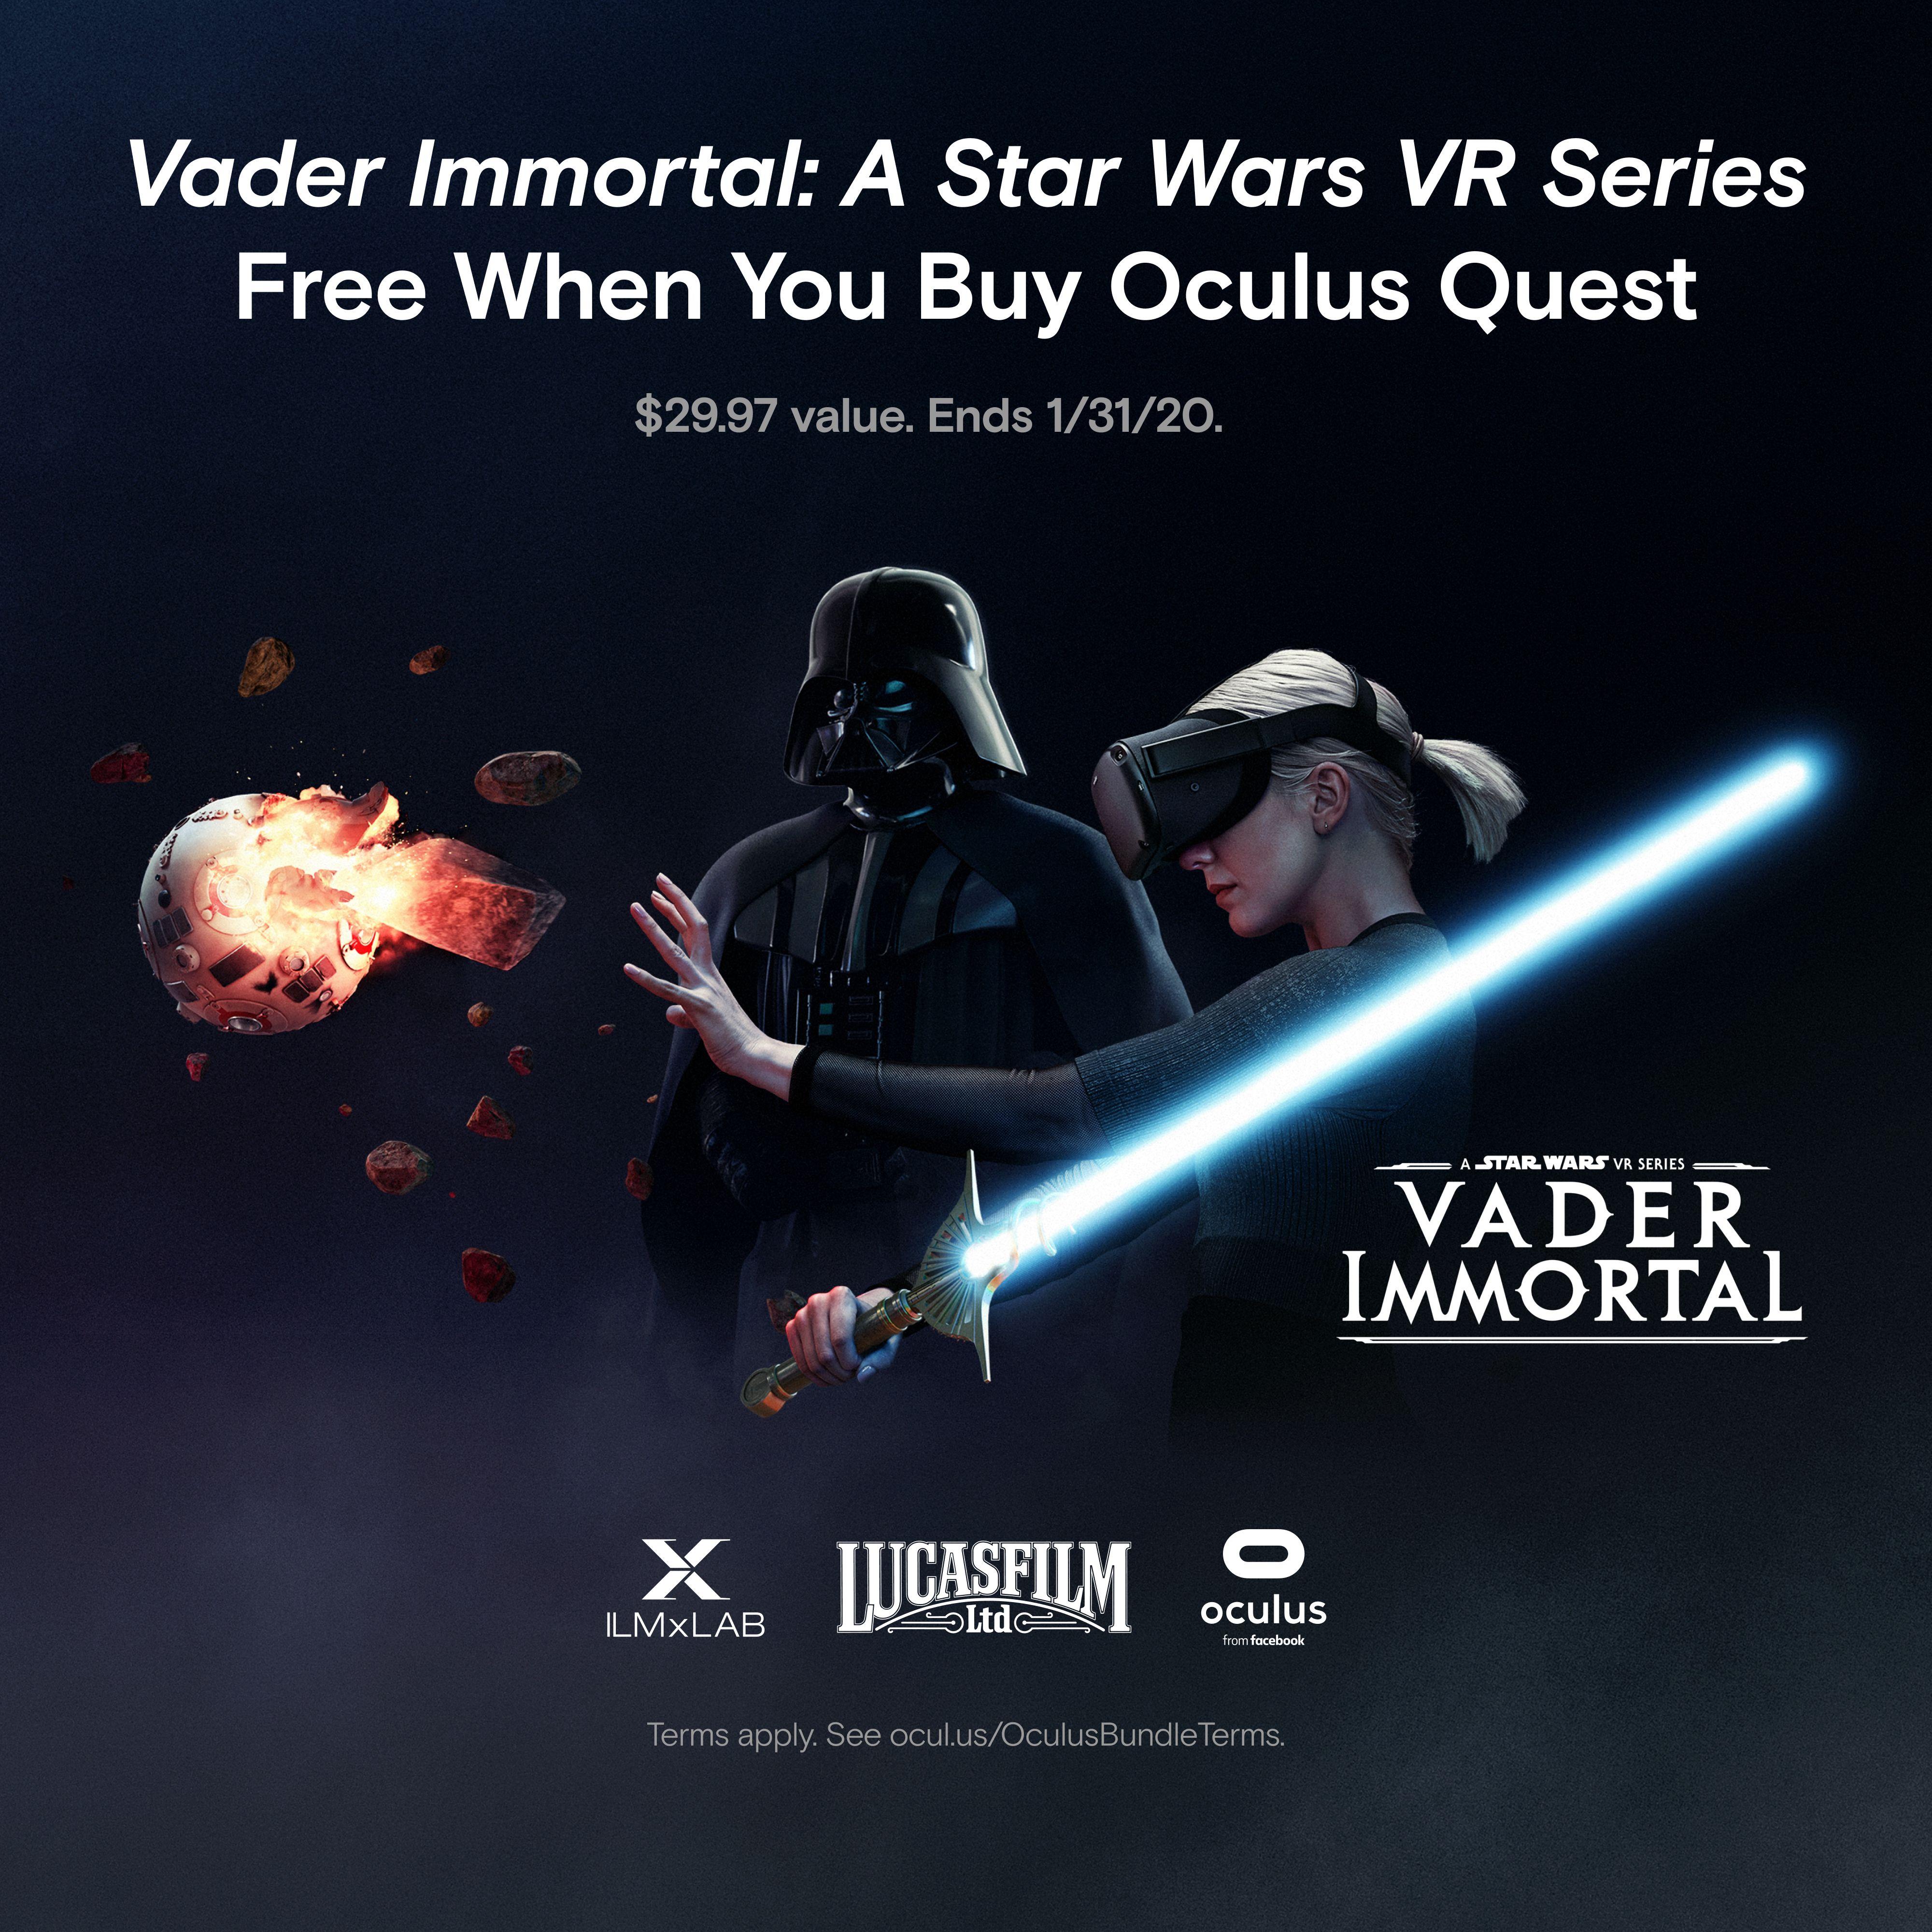 Oculus Quest 64gb Vr Headset Vader Immortal A Star Wars Vr Series